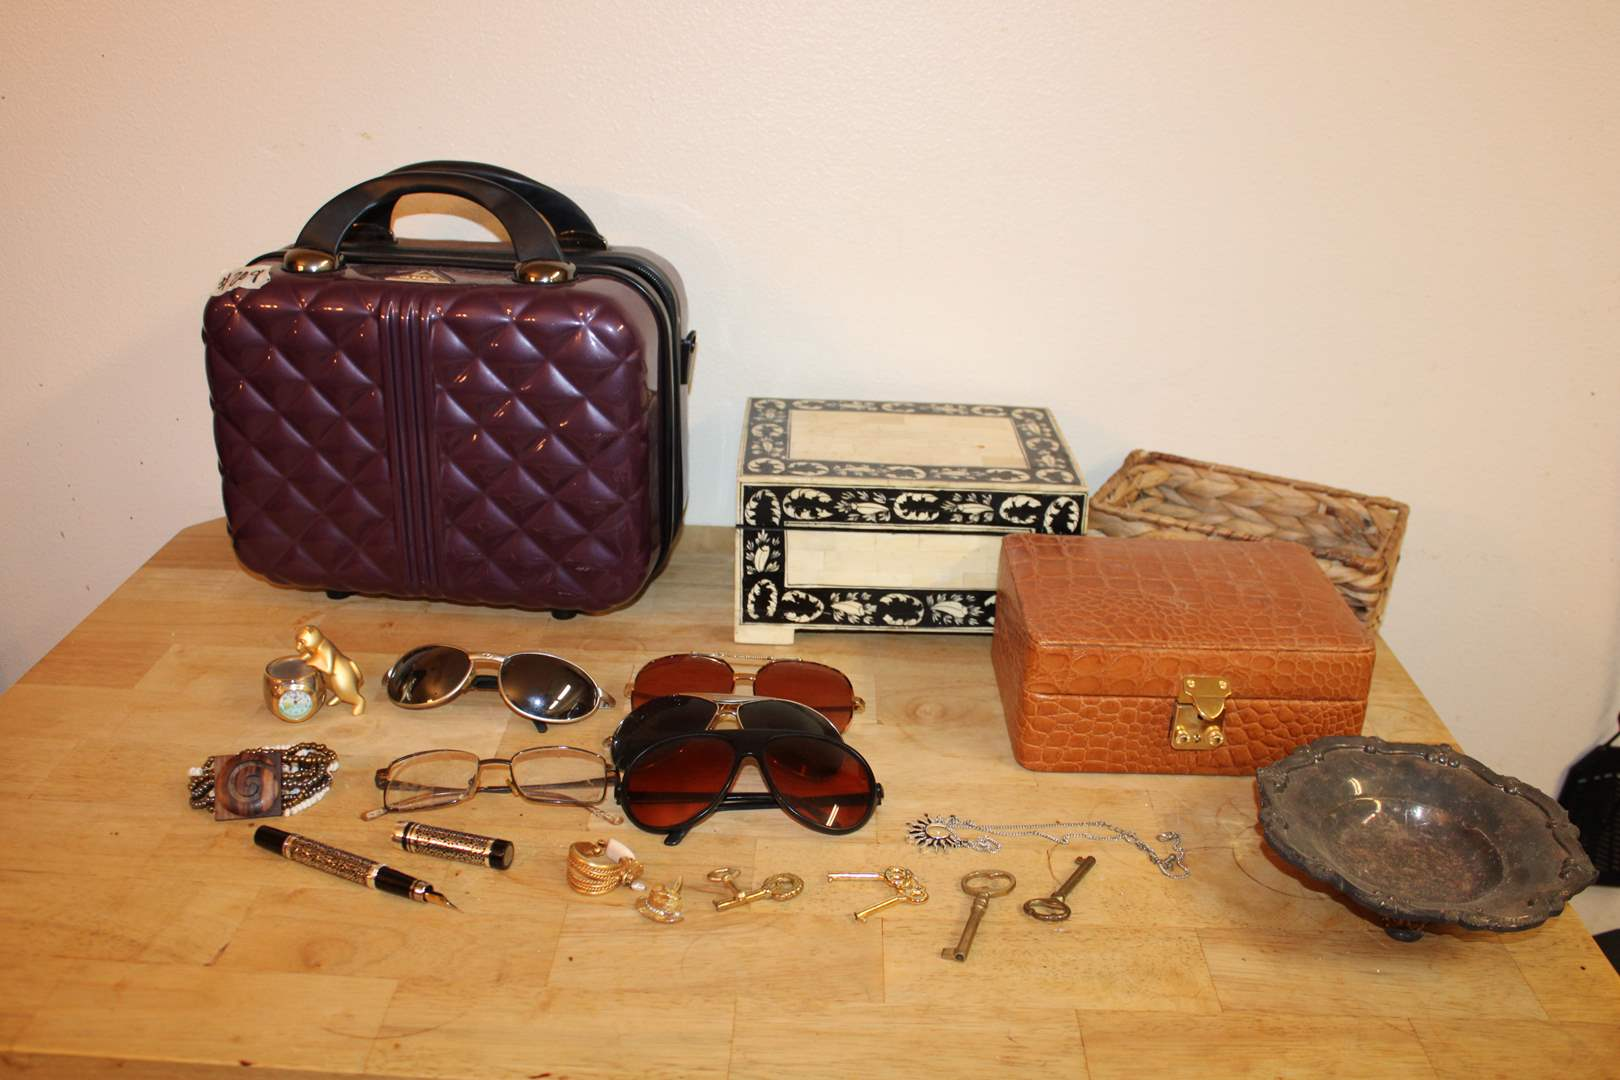 Lot#209 Jewelry box, bowl, trinket box, sunglasses, keys, costume jewelry, Elgin cat desk clock, Triforce makeup travel bag (main image)